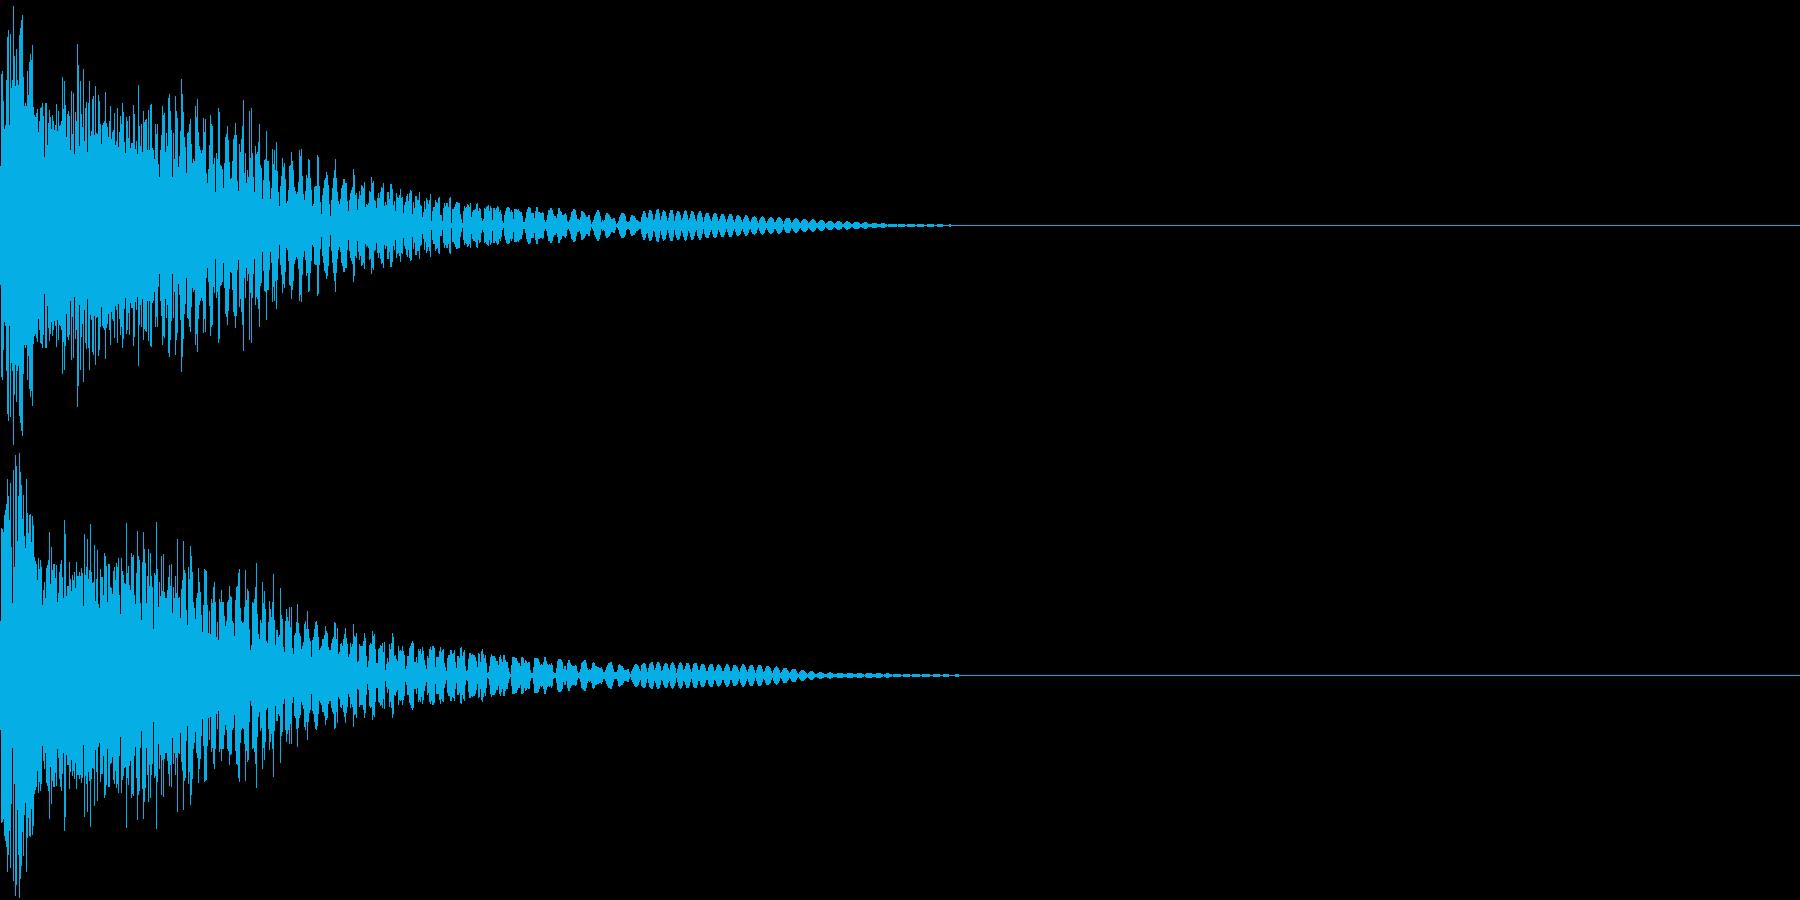 Robo ロボアニメ ビームソード斬撃音の再生済みの波形